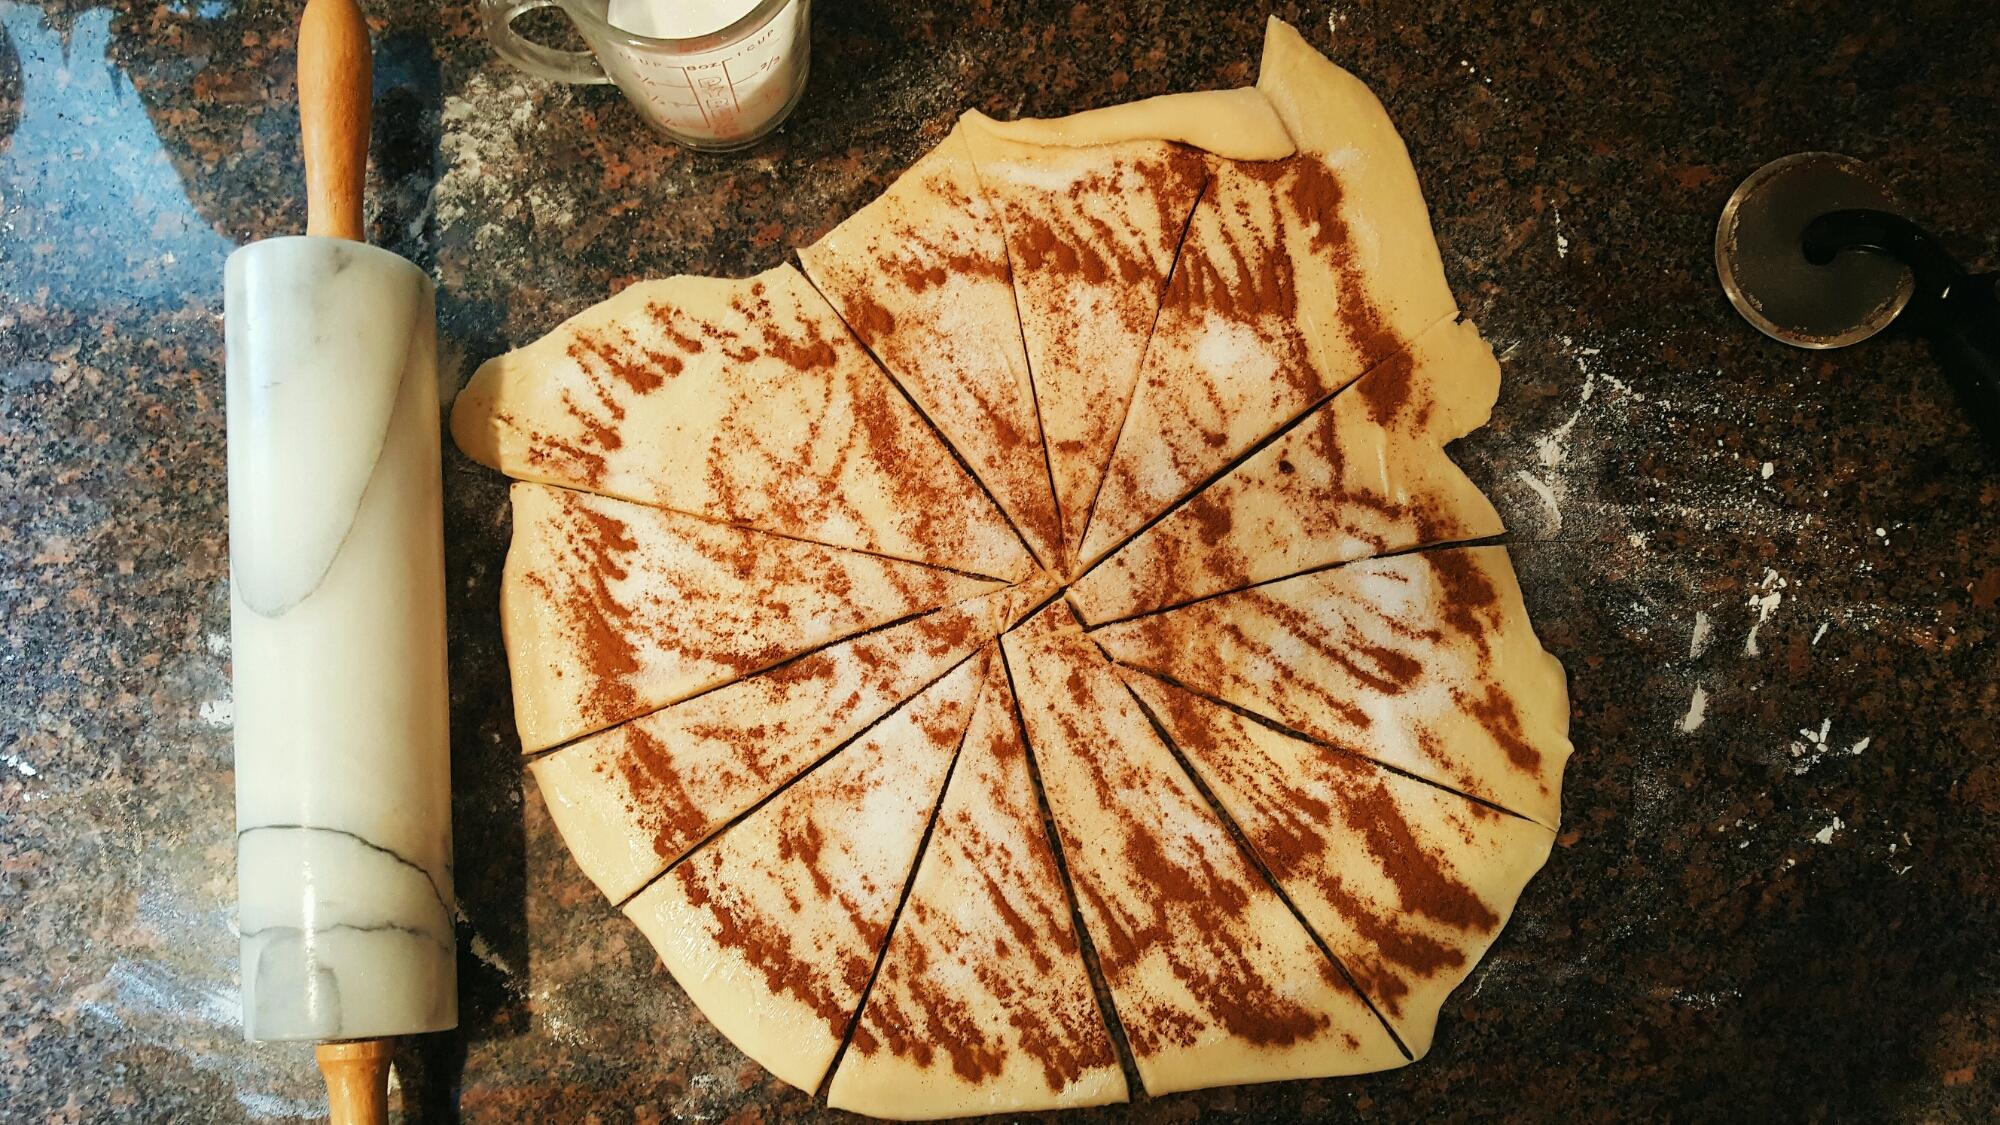 wp image 309686190jpg - Homemade Cinnamon Croissants